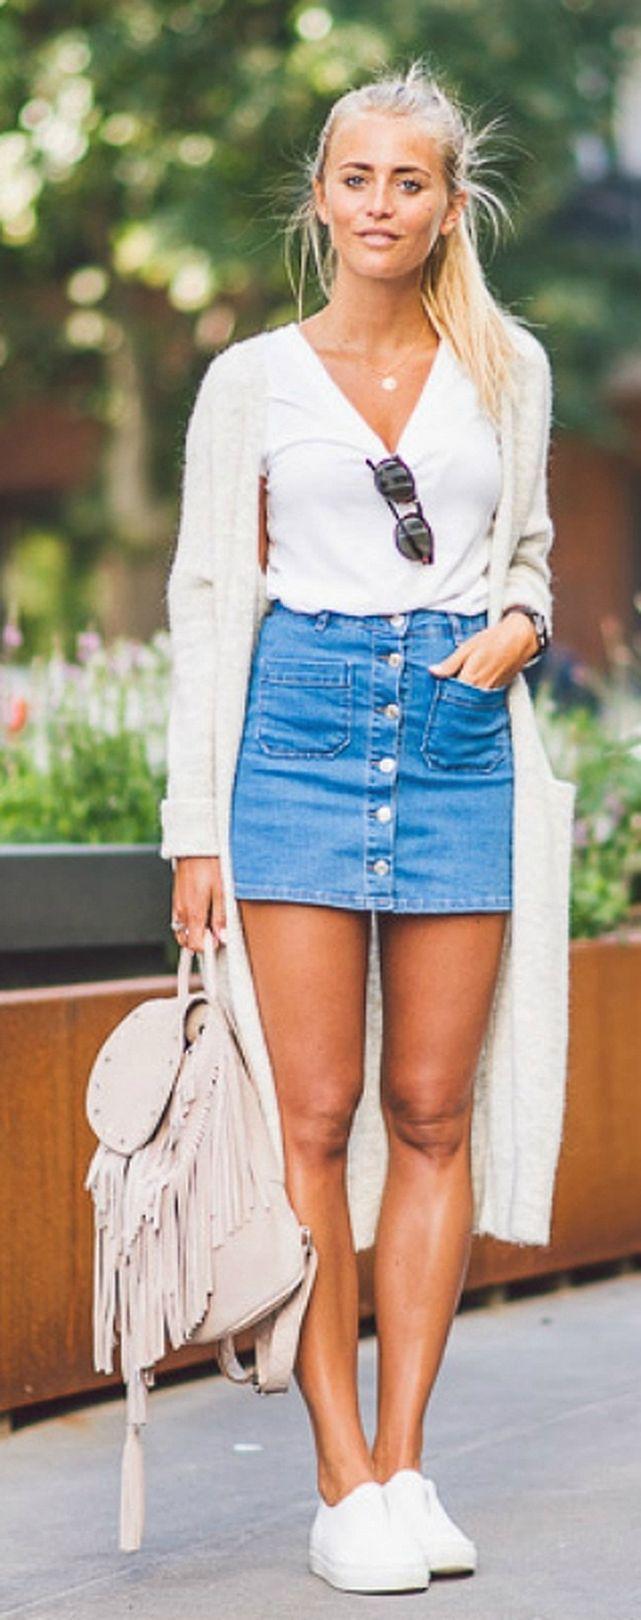 Best 25+ Skirt outfits ideas on Pinterest | Denim skirt Spring skirts outfits and School skirt ...